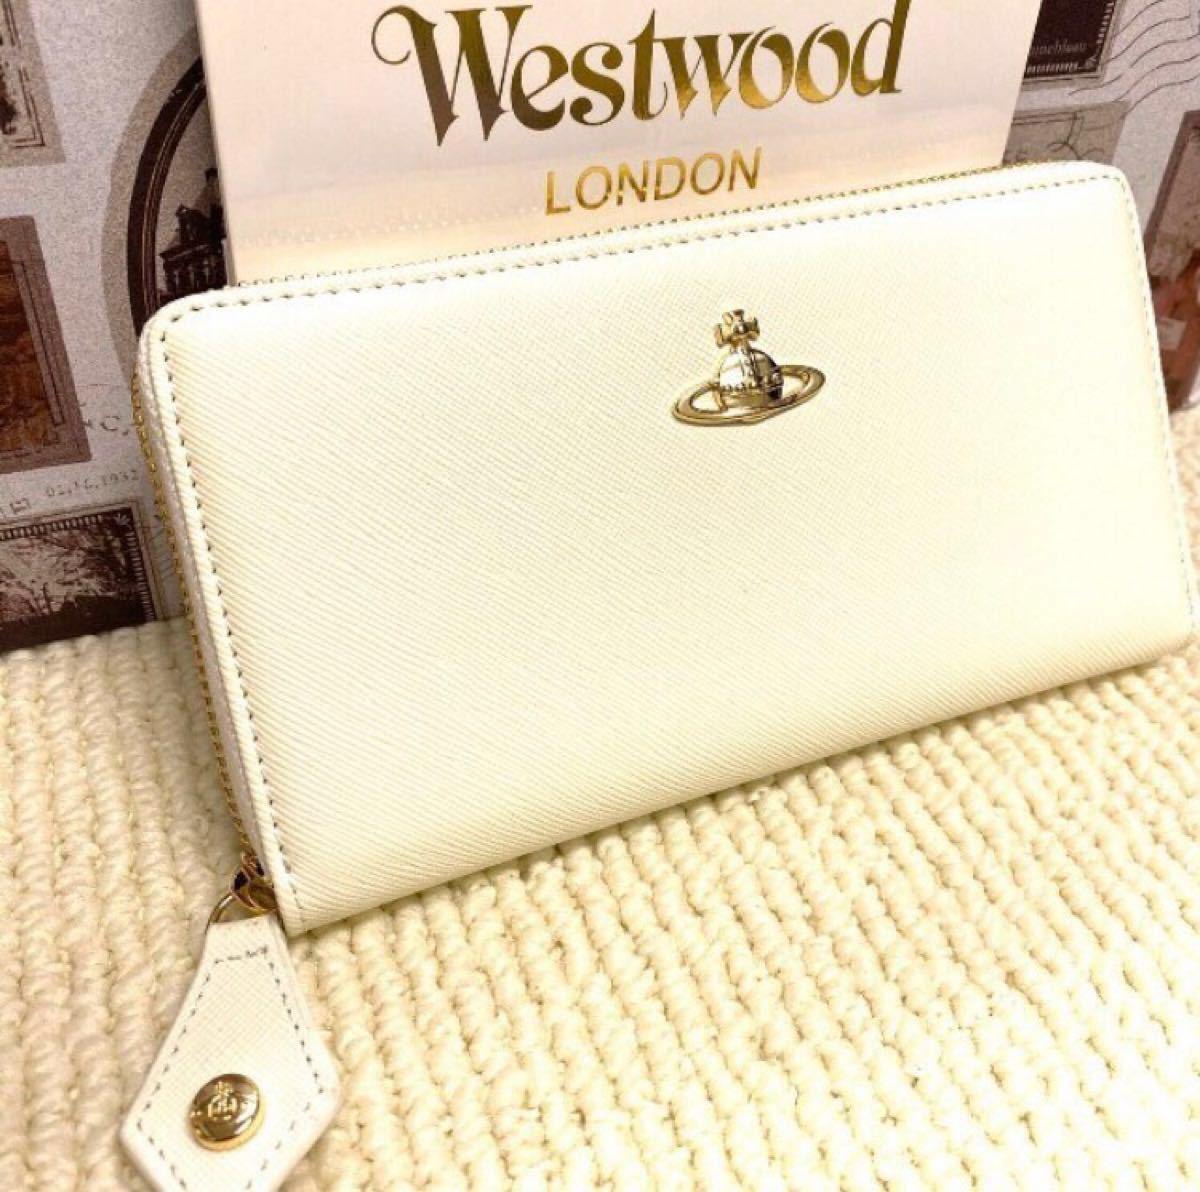 Vivienne Westwood 長財布【ホワイト】 ヴィヴィアンウエストウッド  長財布レディース ヴィヴィアン財布